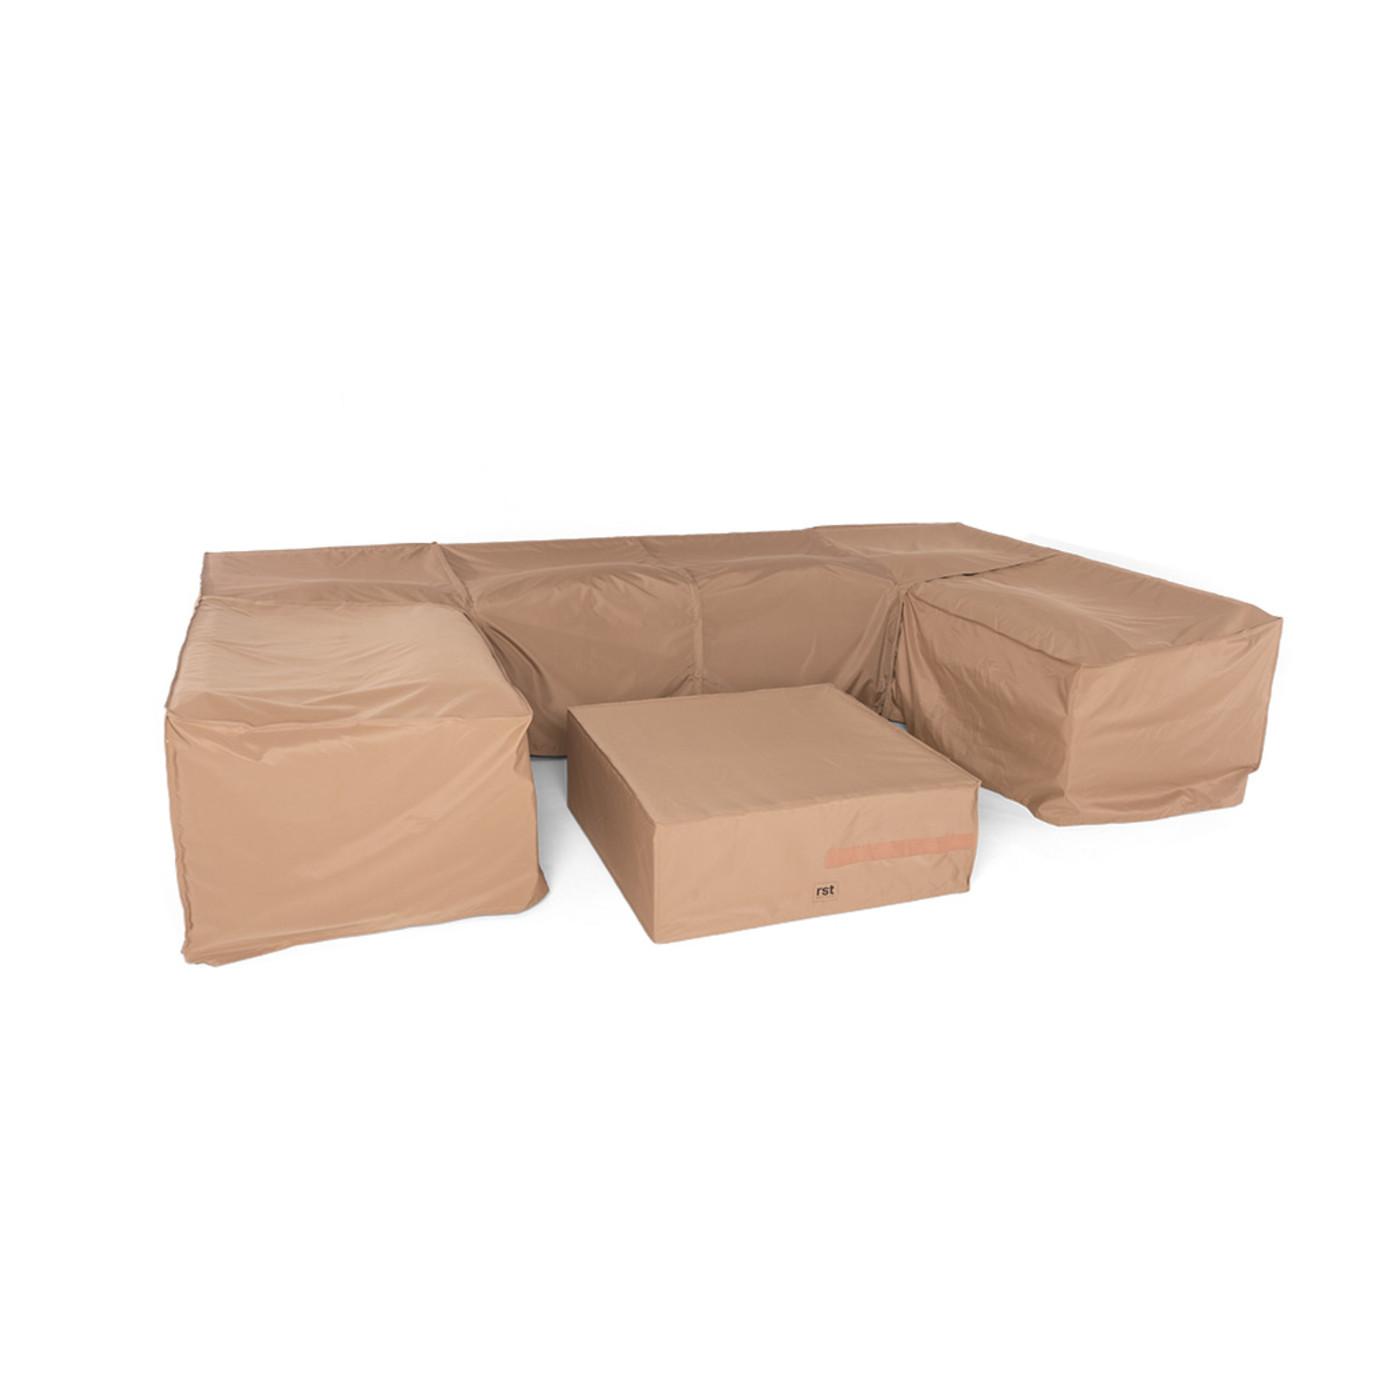 Portofino™ Zipper Furniture Covers for 7pc U Sectional